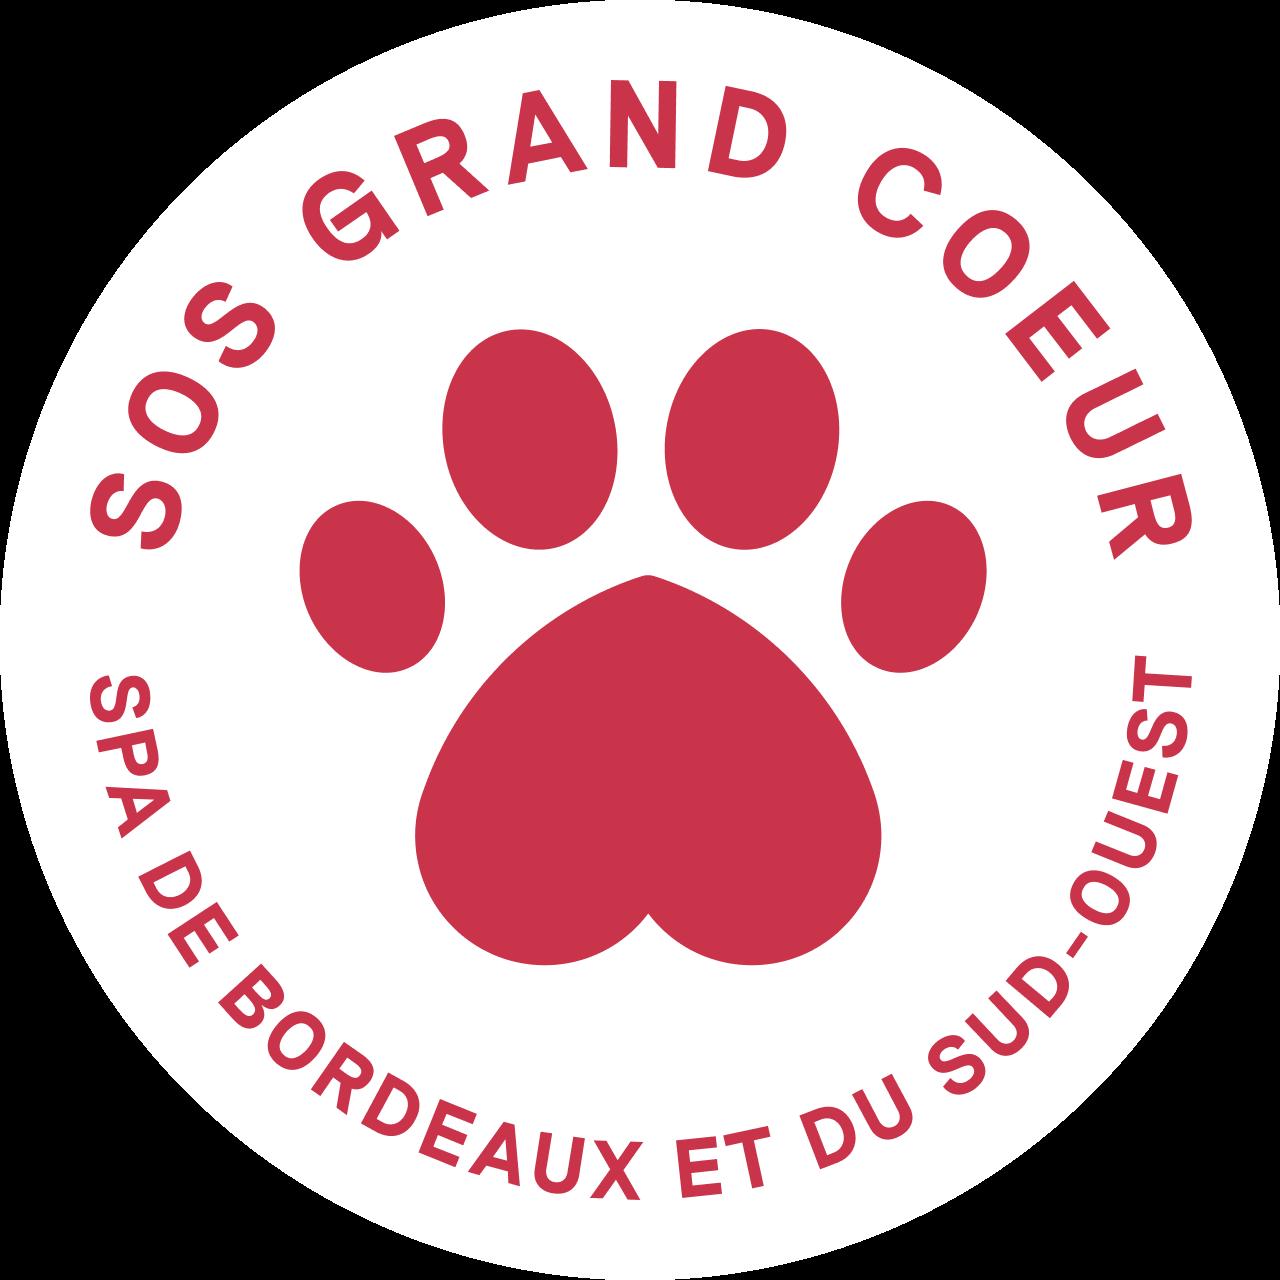 SOS Grand Cœur ?